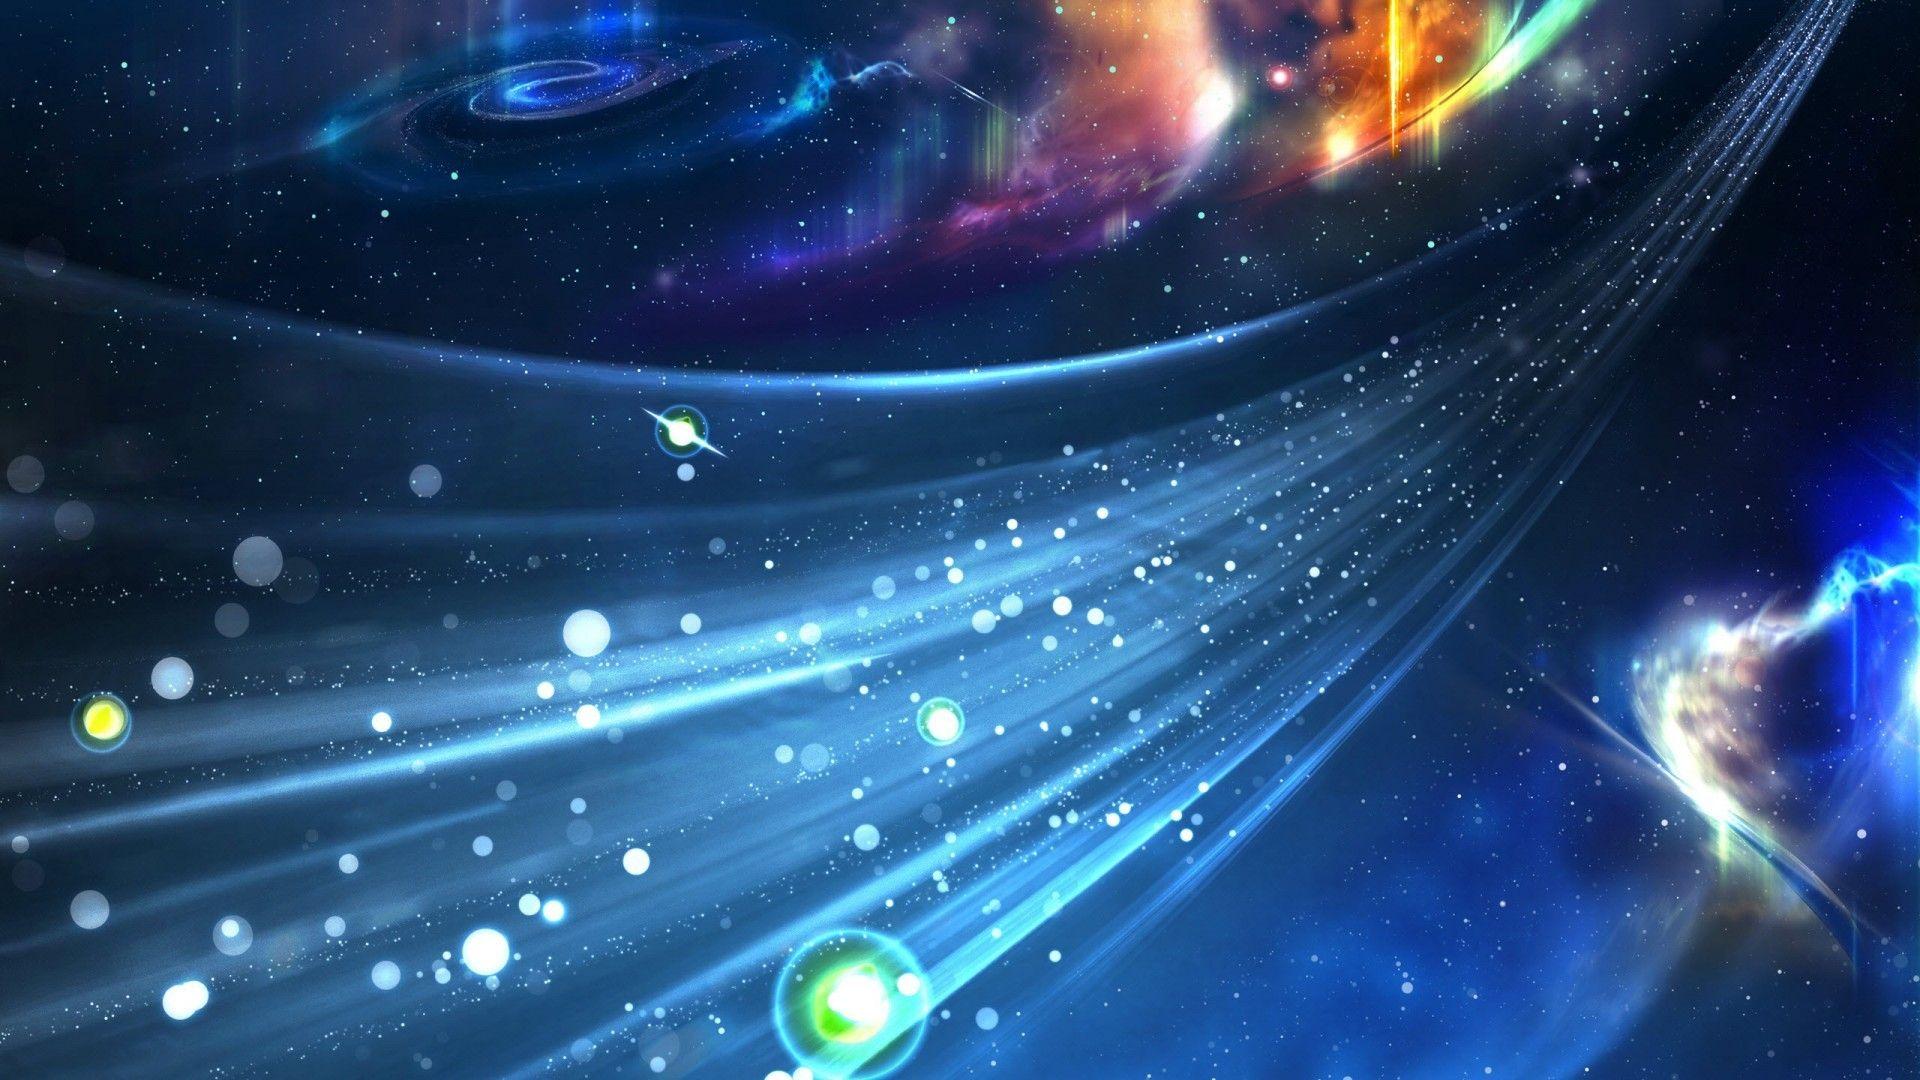 Best Wallpaper Music Space - 05856a37ea22cd7830b8a2781997bef0  HD_2939.jpg